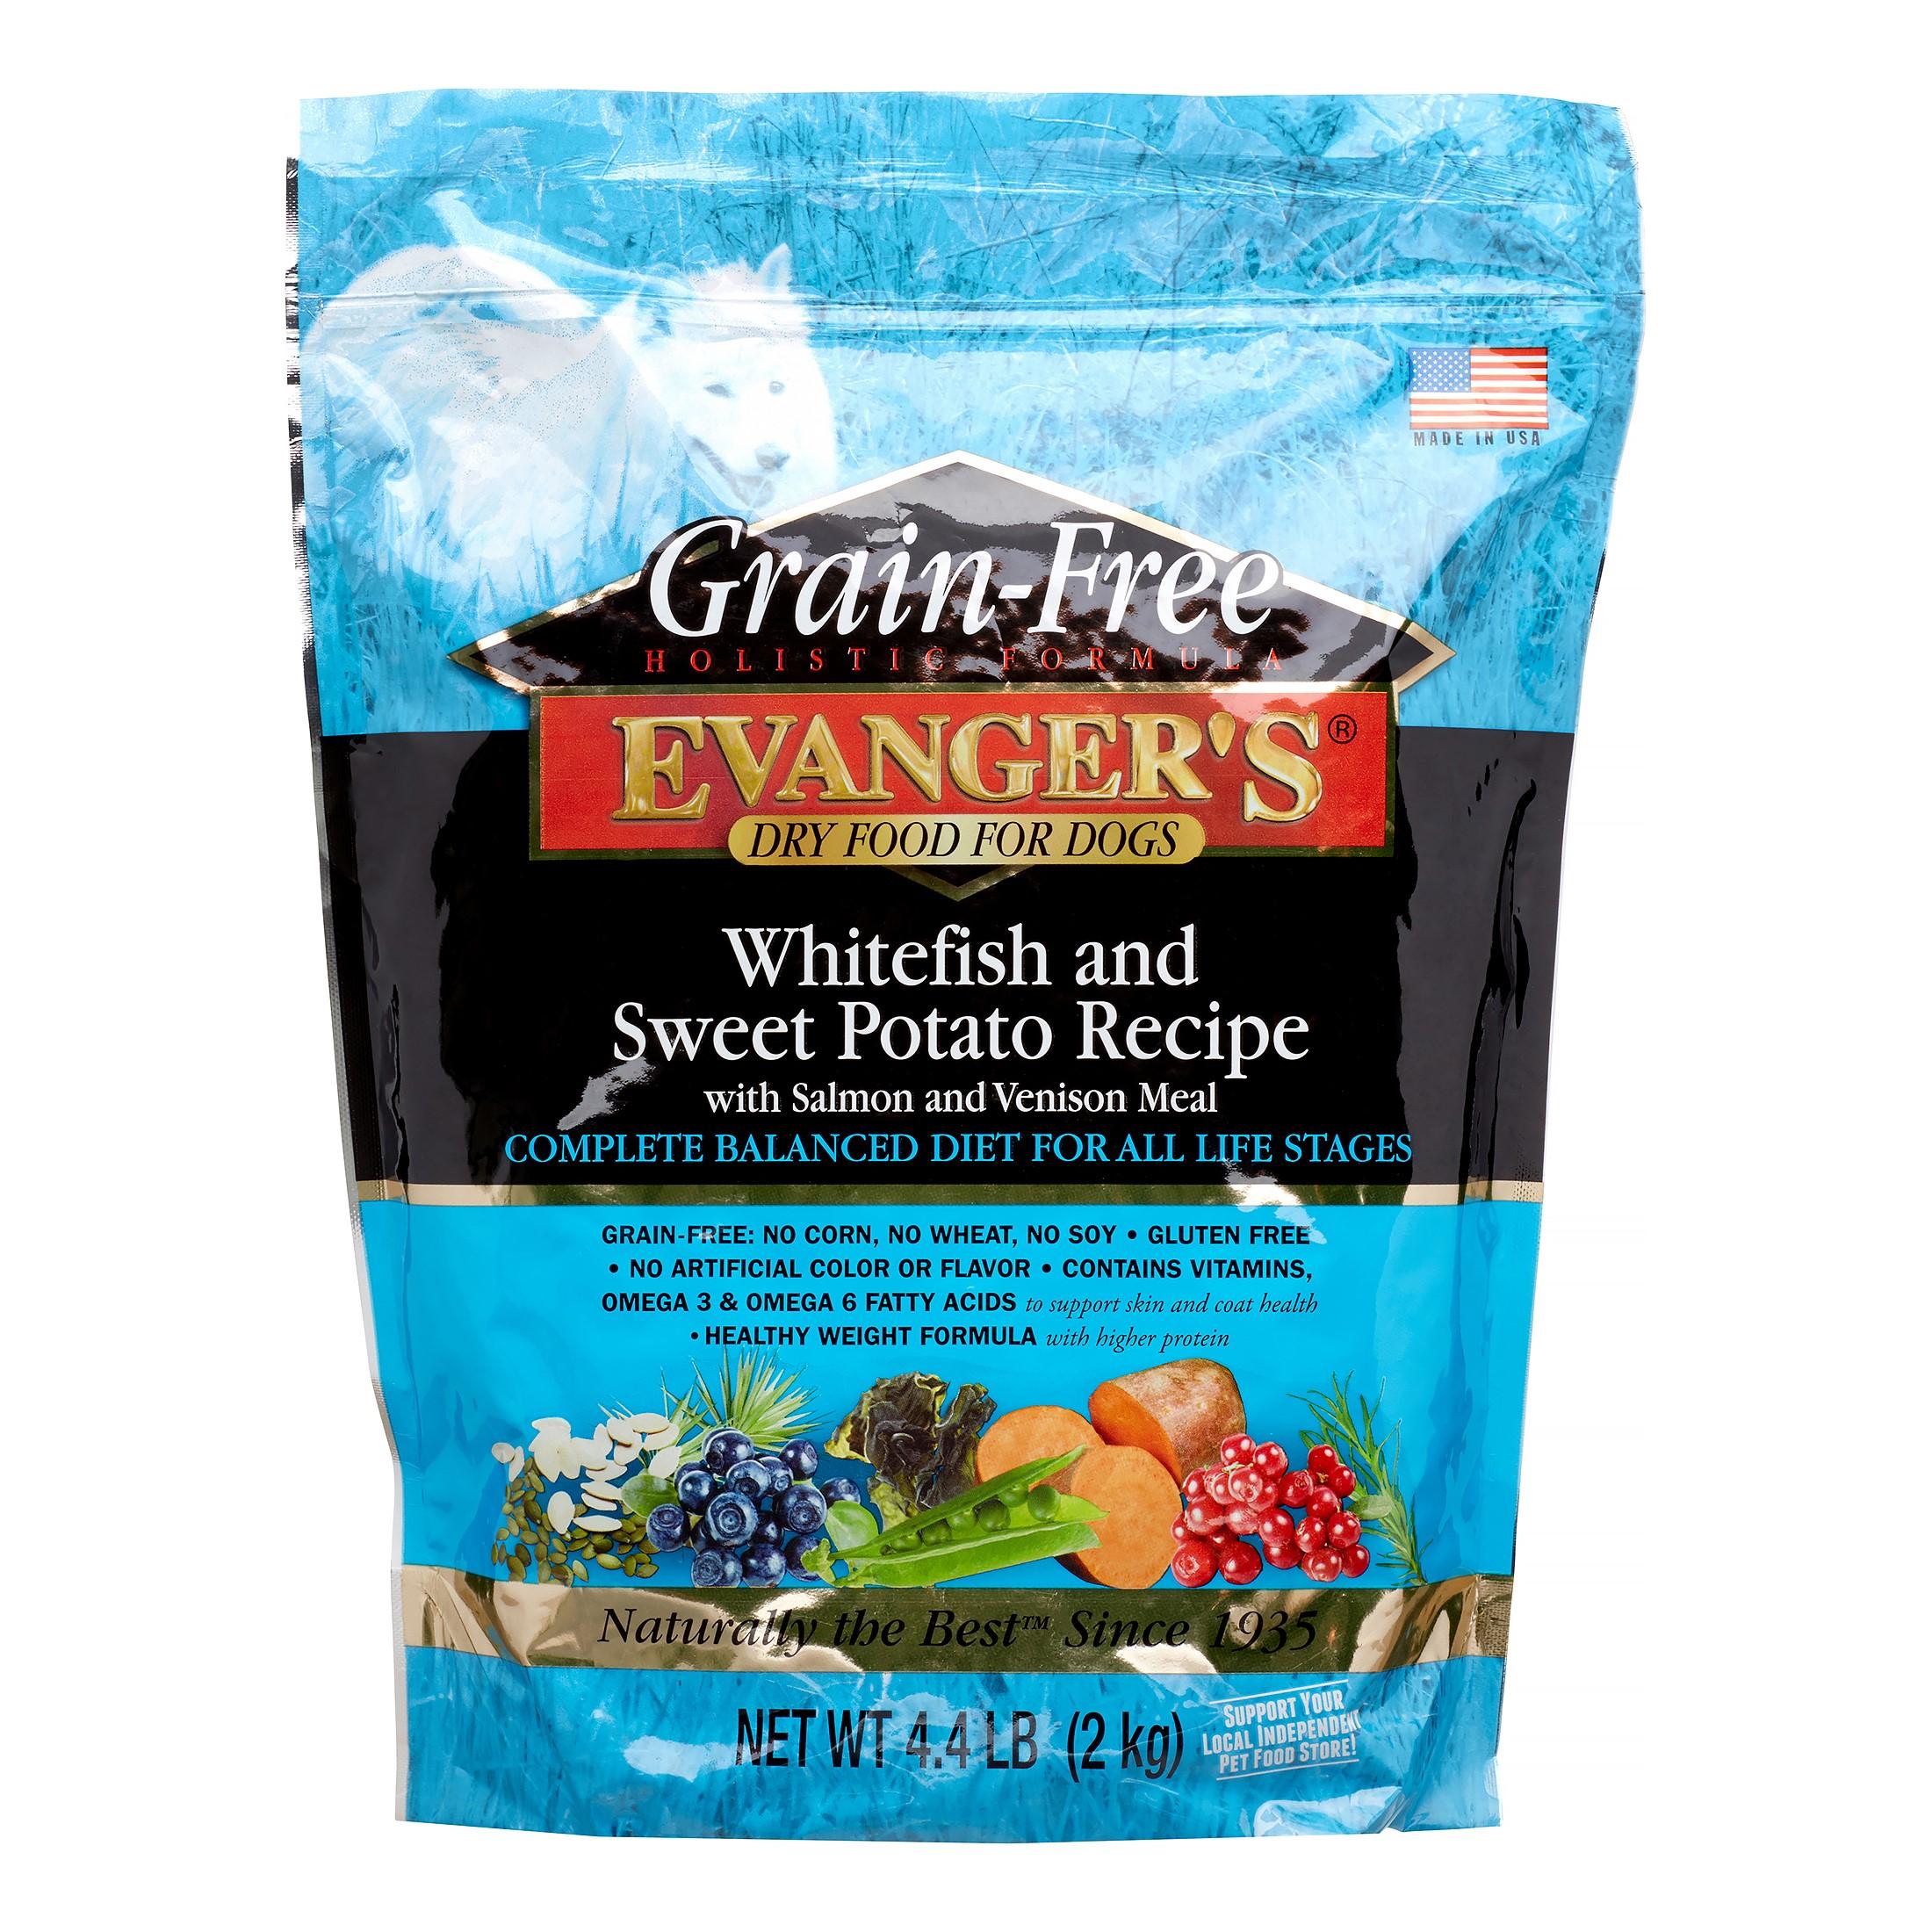 Evanger's Super Premium Whitefish & Sweet Potato Formula Grain-Free Dry Dog Food